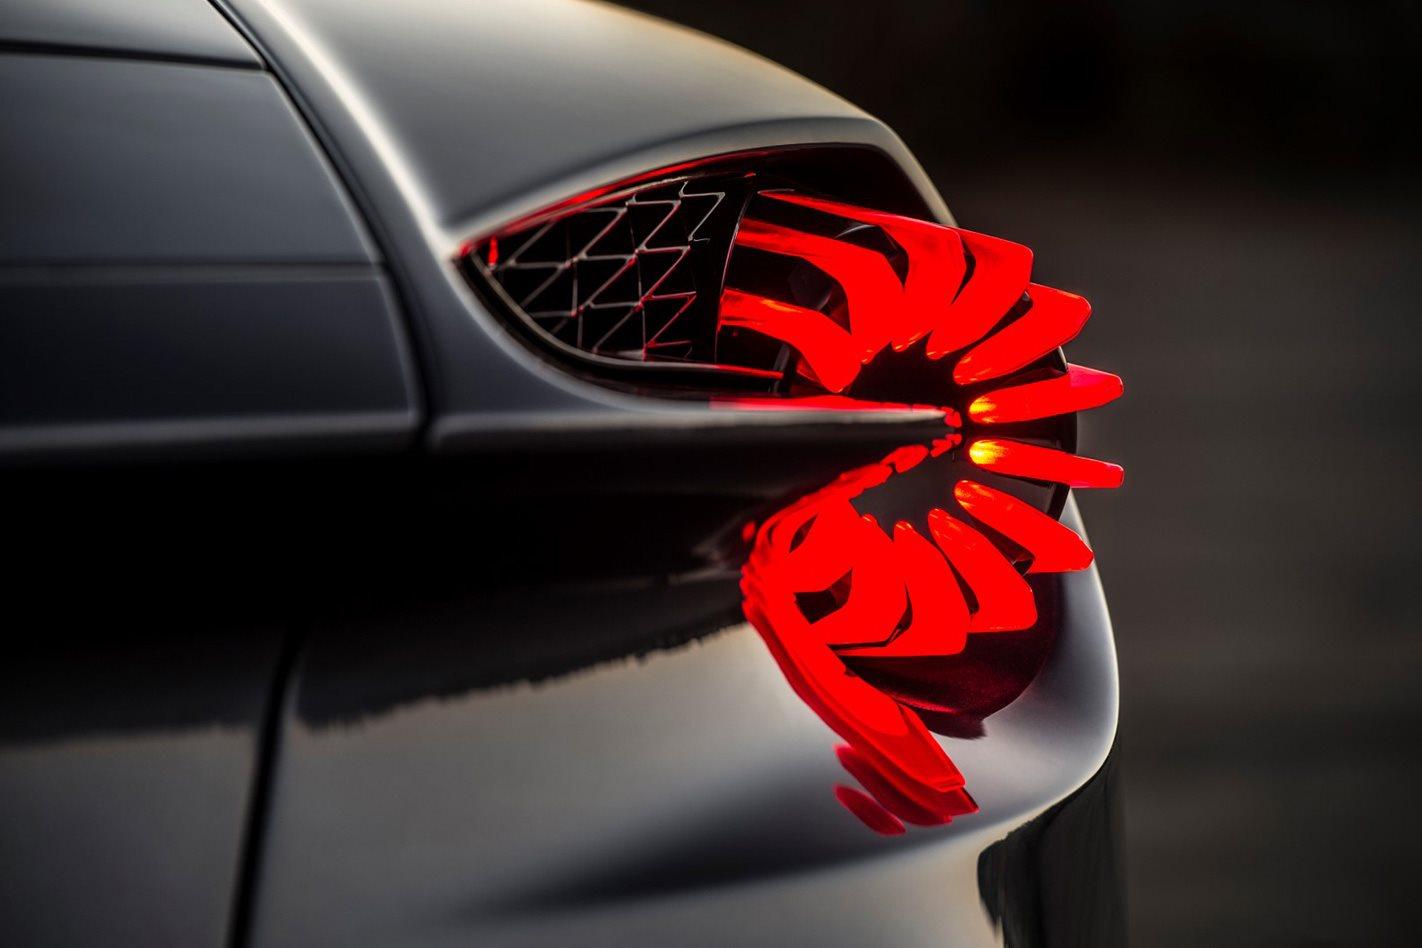 Aston Martin Vanquish Zagato brakelight